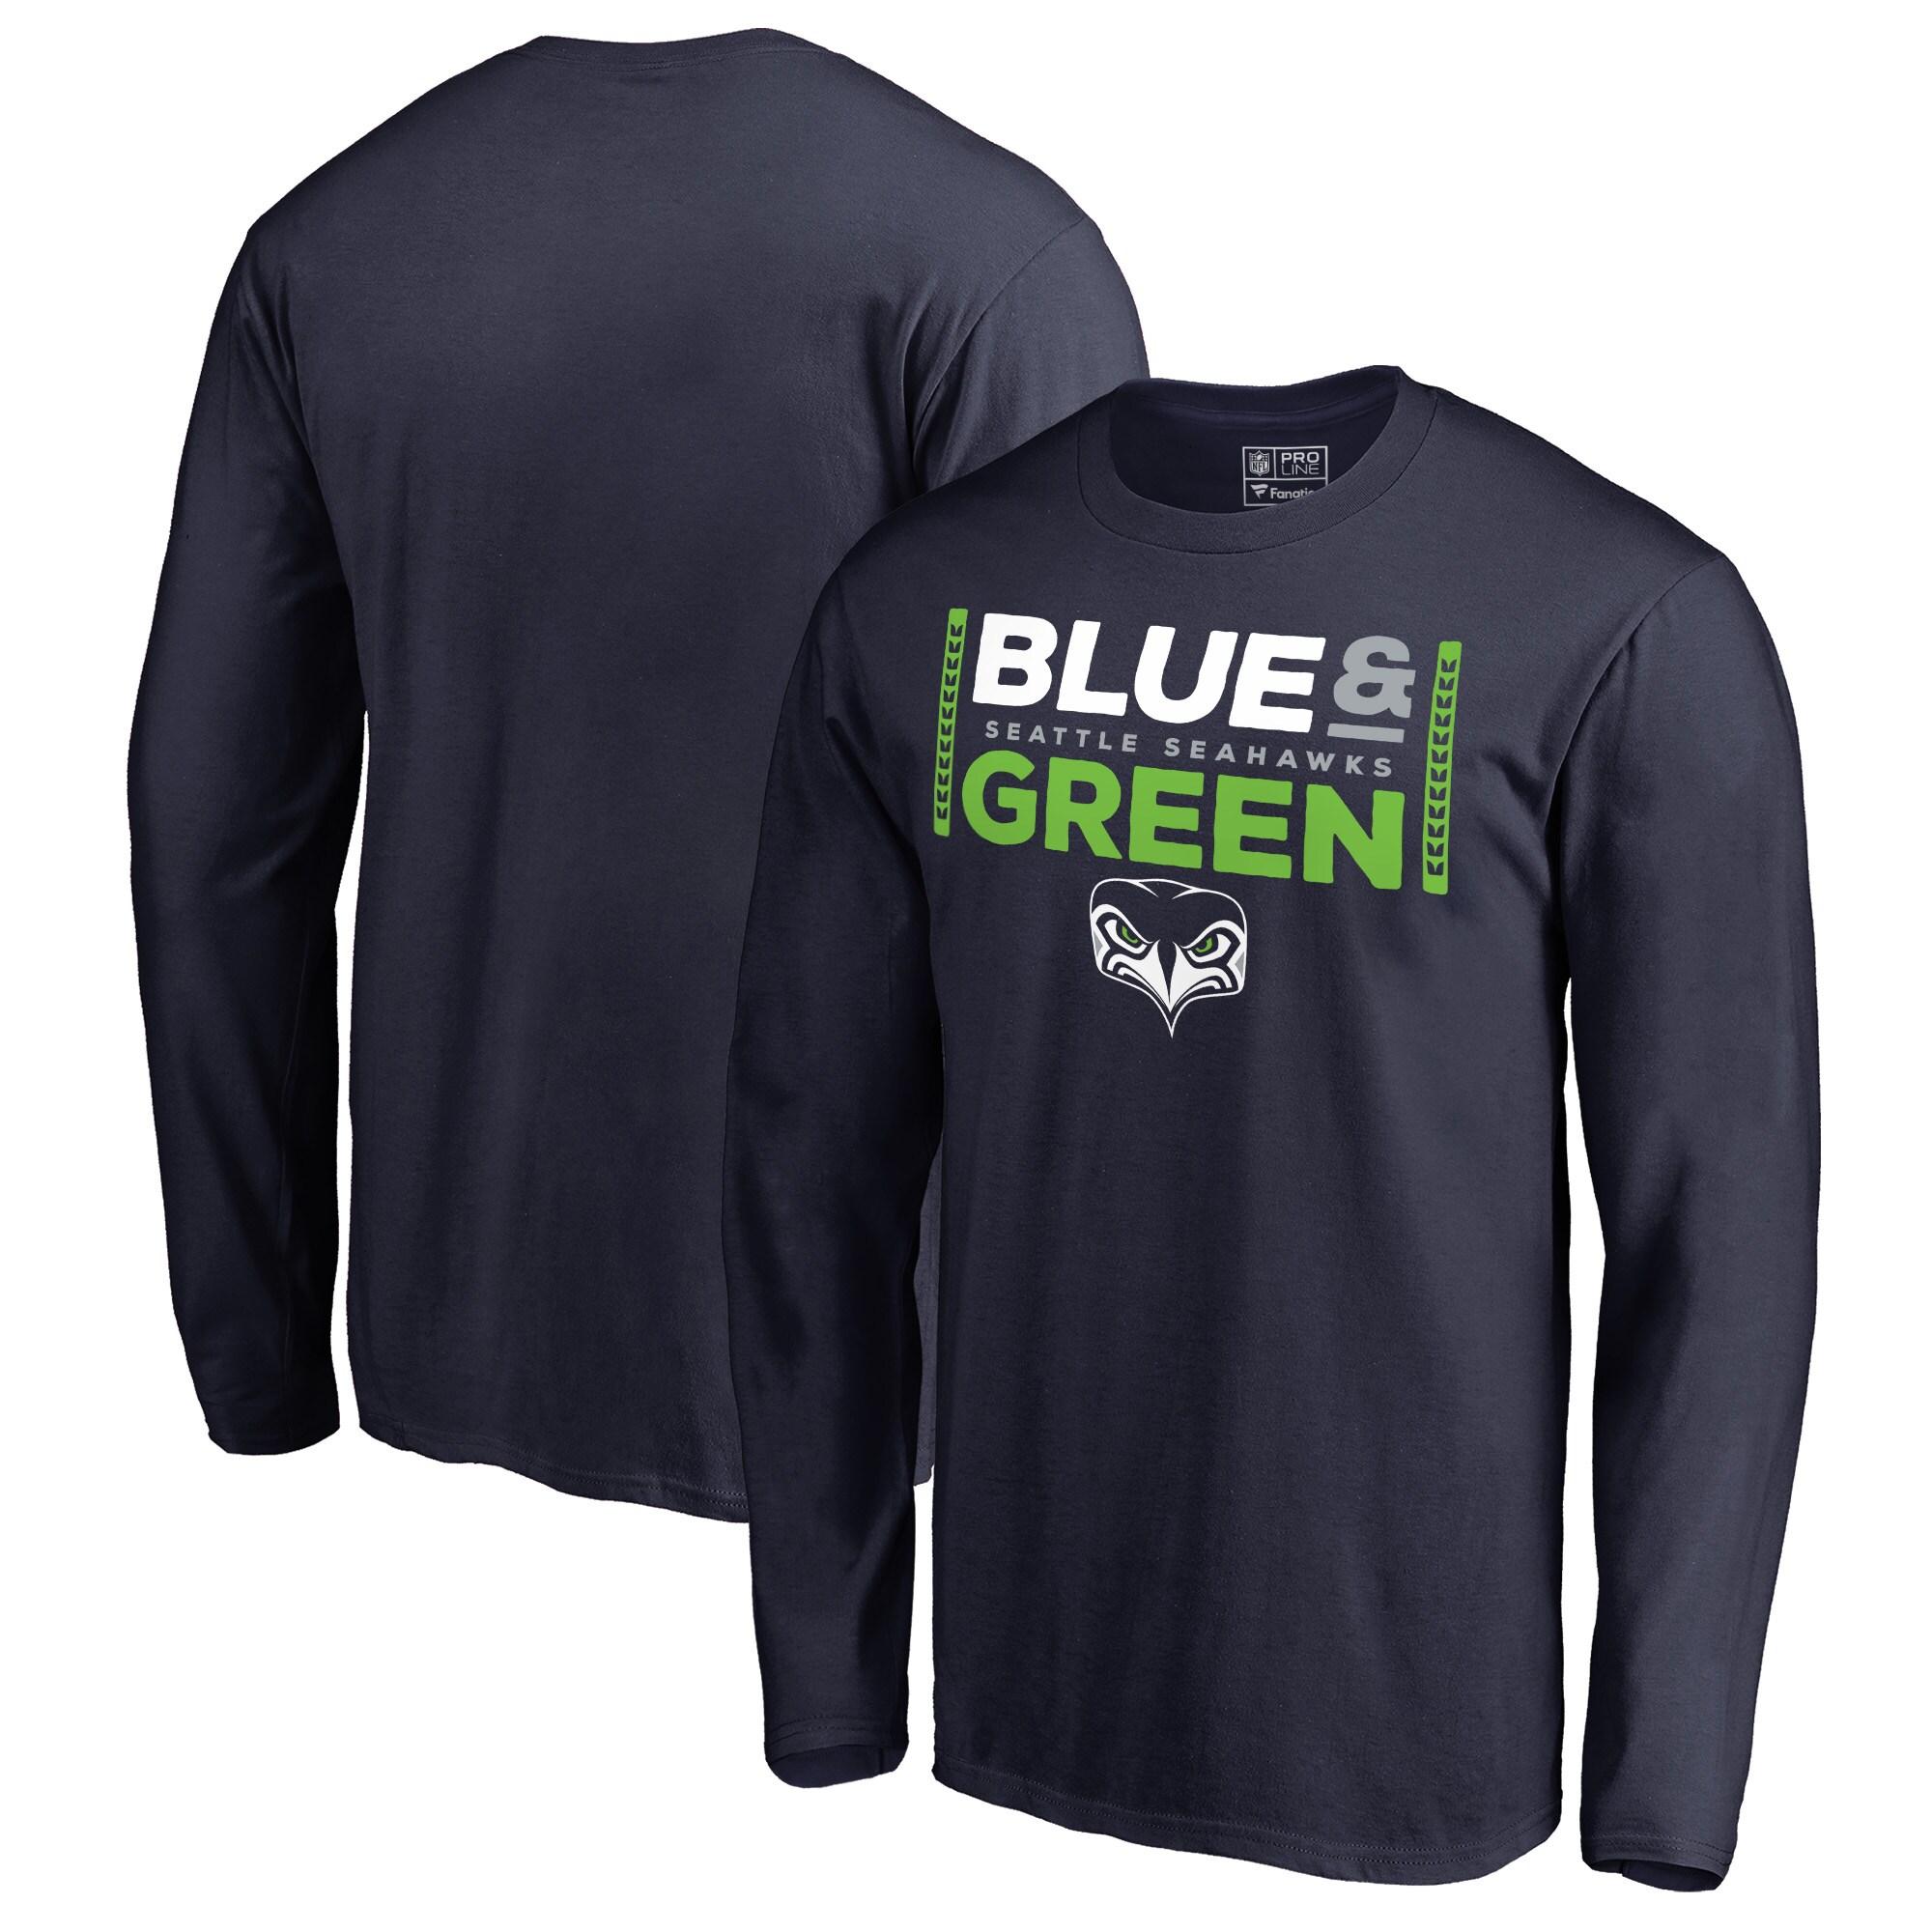 Seattle Seahawks NFL Pro Line by Fanatics Branded Alternate Team Logo Gear Blue & Green Long Sleeve T-Shirt - College Navy